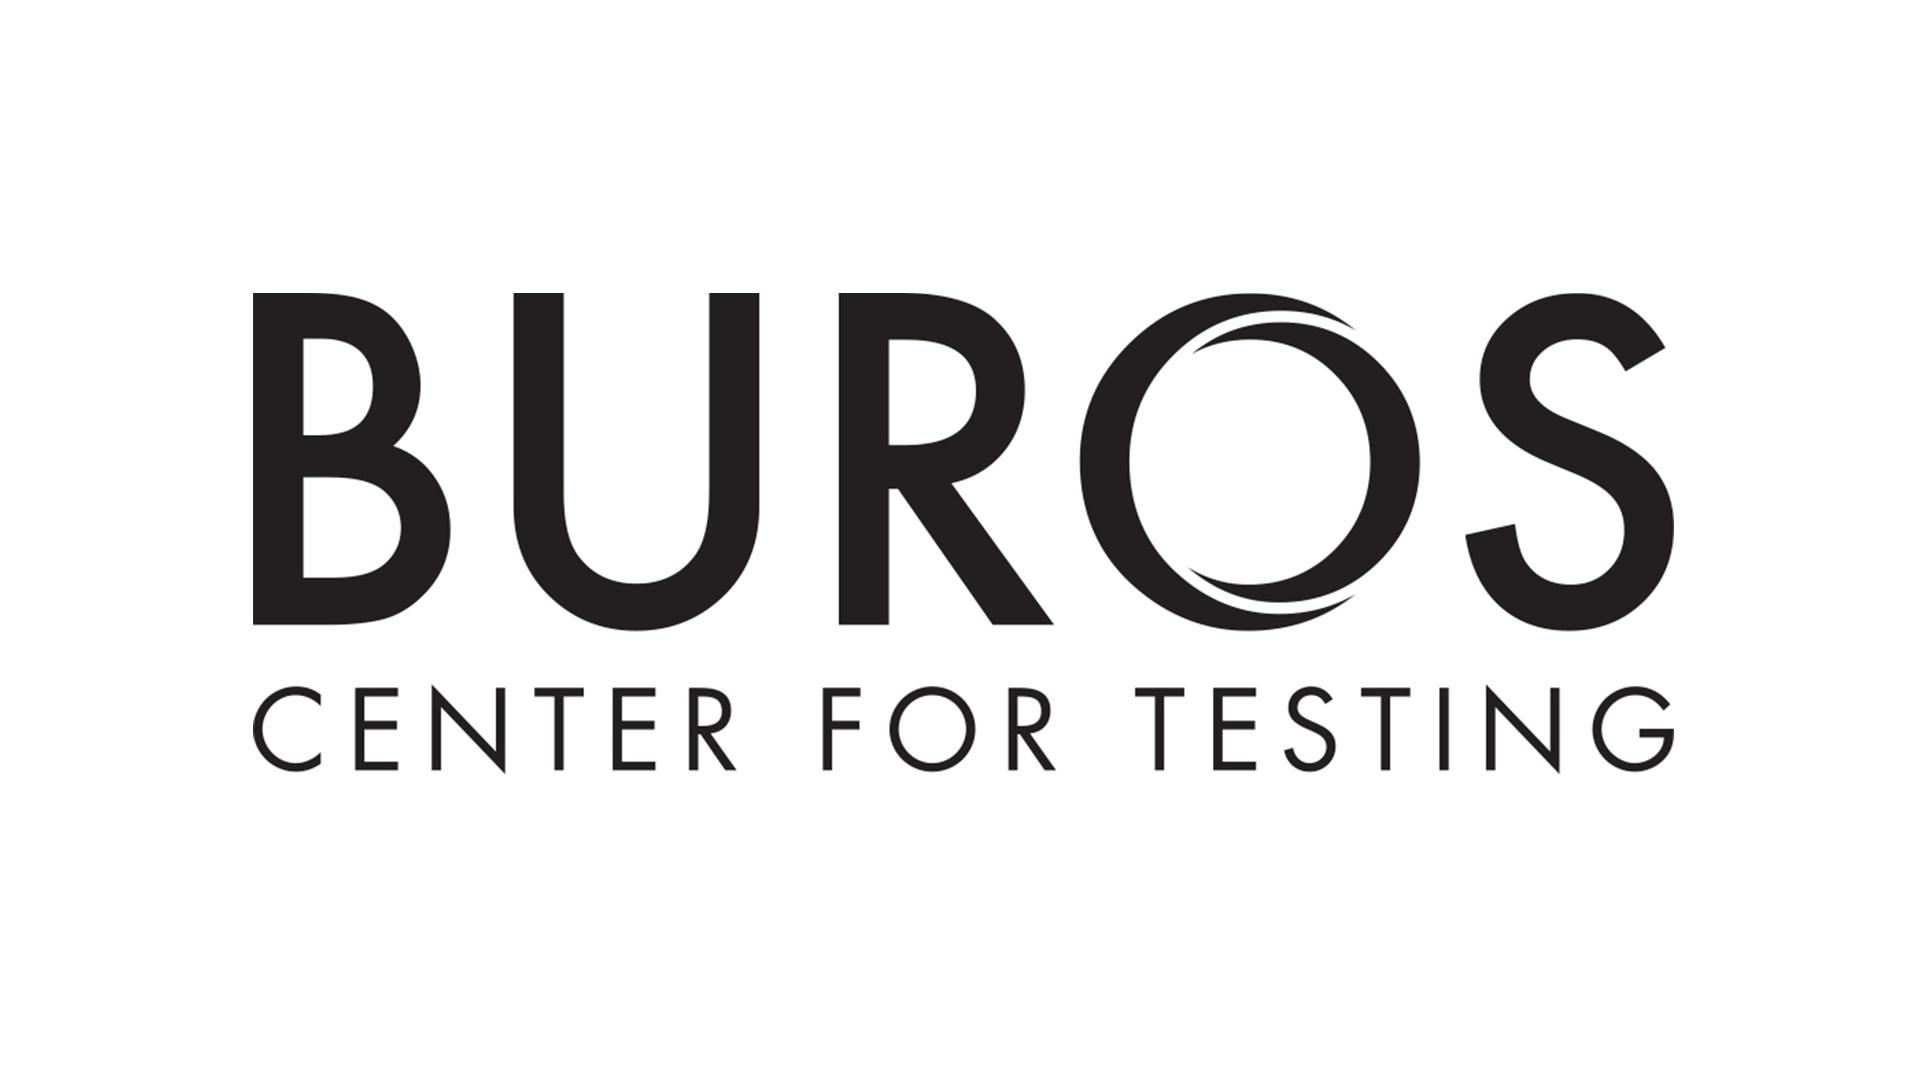 Buros Center for Testing Image